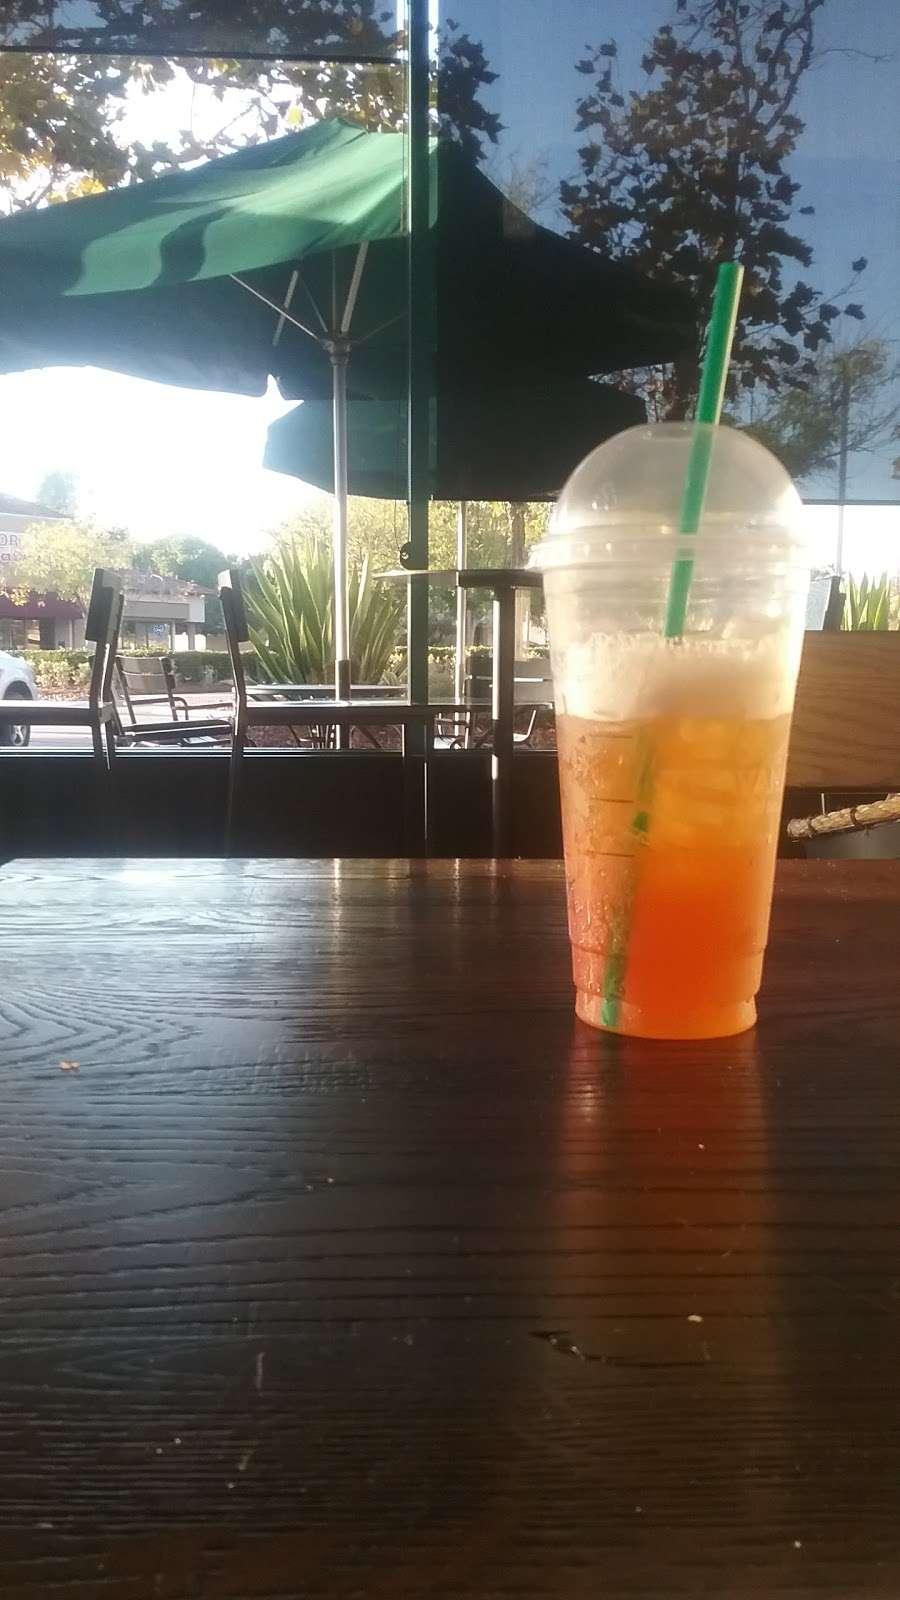 Starbucks - cafe    Photo 9 of 10   Address: 14835 Pomerado Rd, Poway, CA 92064, USA   Phone: (858) 391-1003